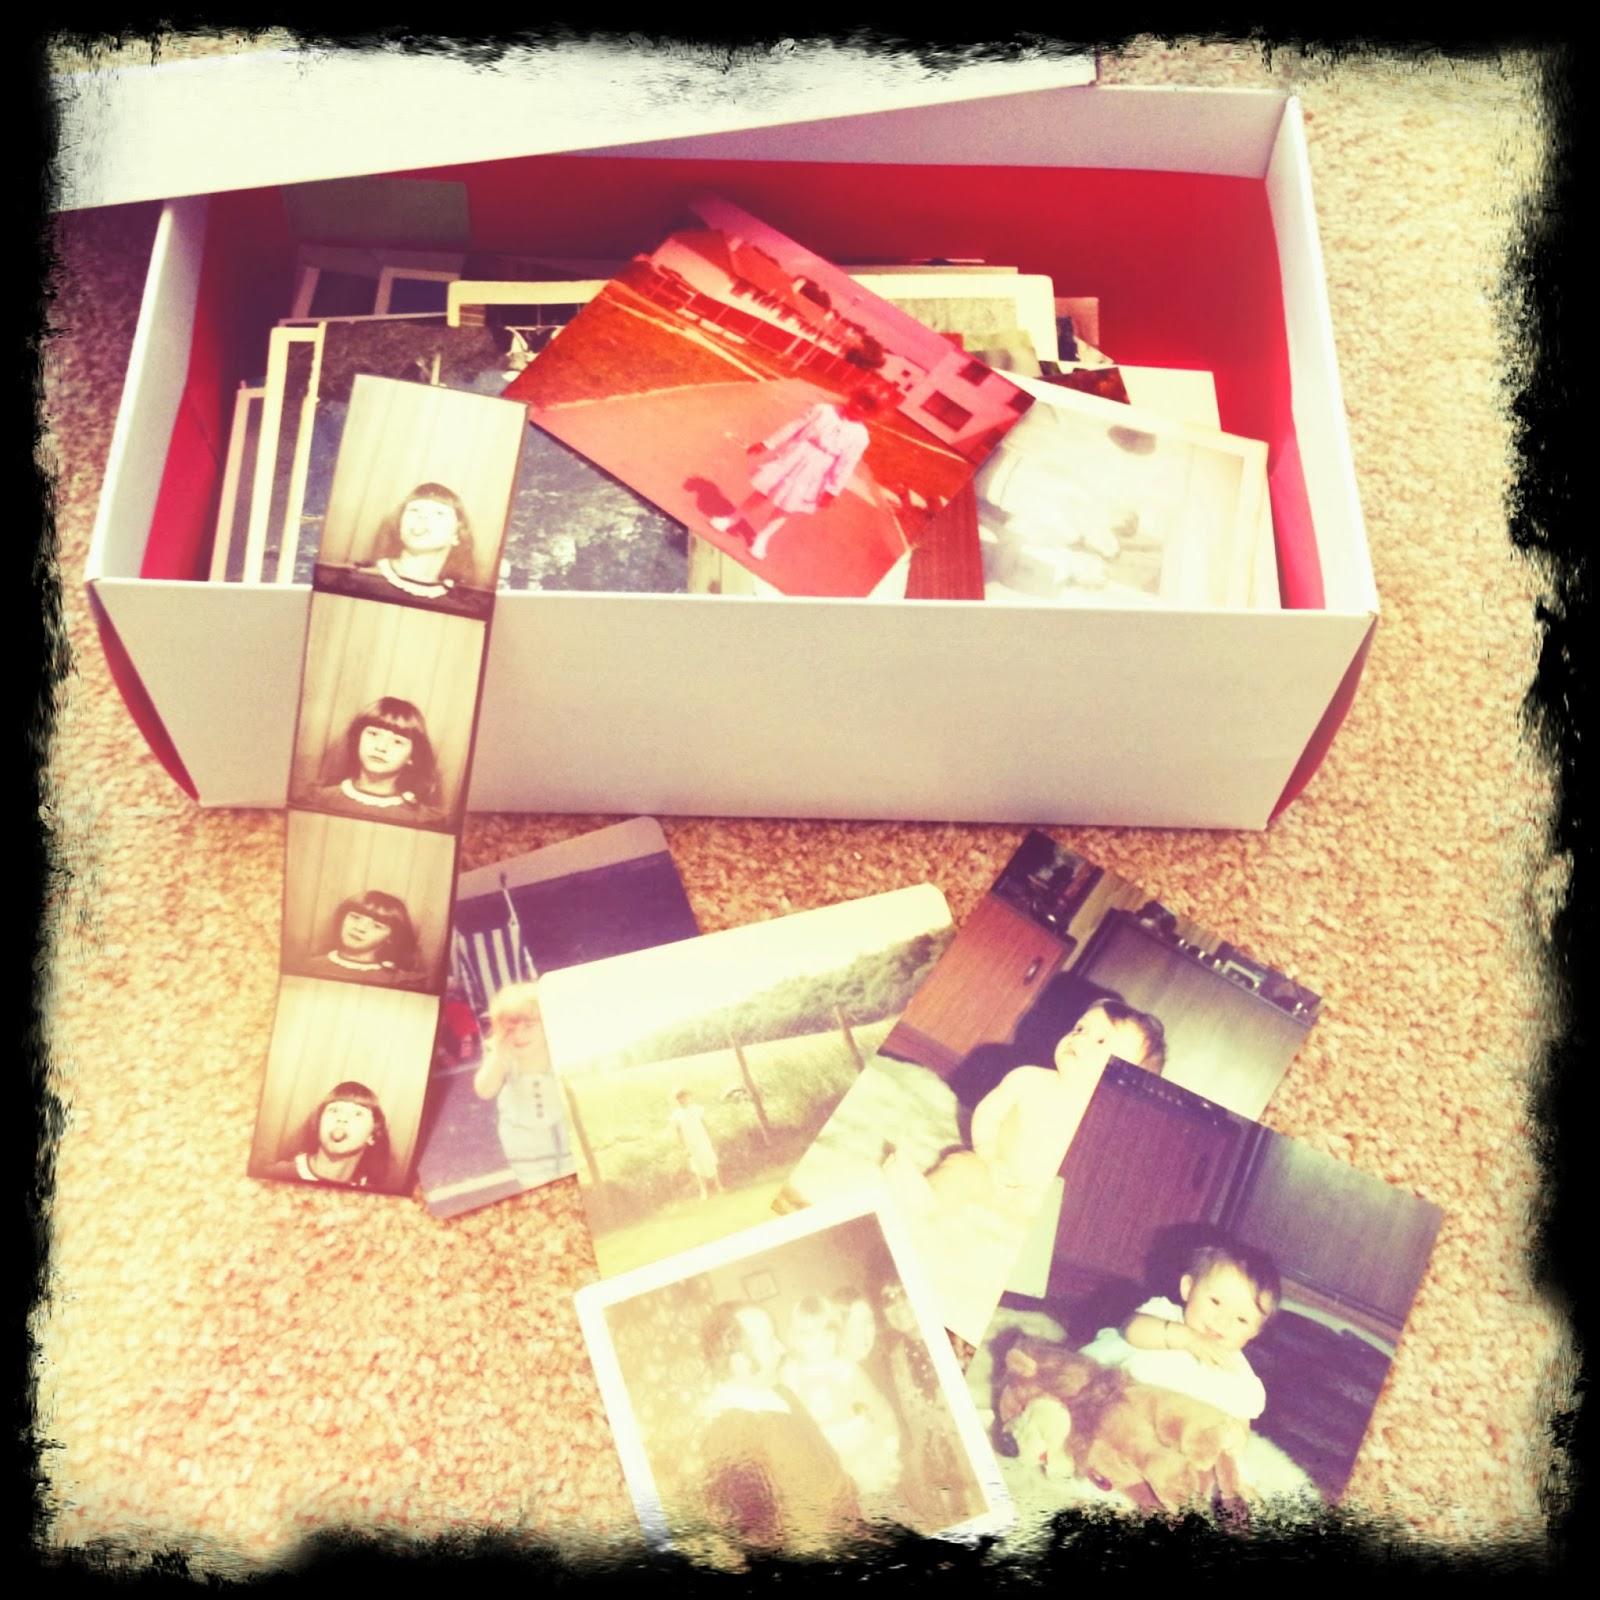 mamasVIB | V. I. BABYBRAIN: How to cherish those photos - old and new with Vintage Photo Lab, V. I. BOOK | How to cherish those photo | vintage photo lab | pocket booth | retro photos | baby book ideas | mamasVIB